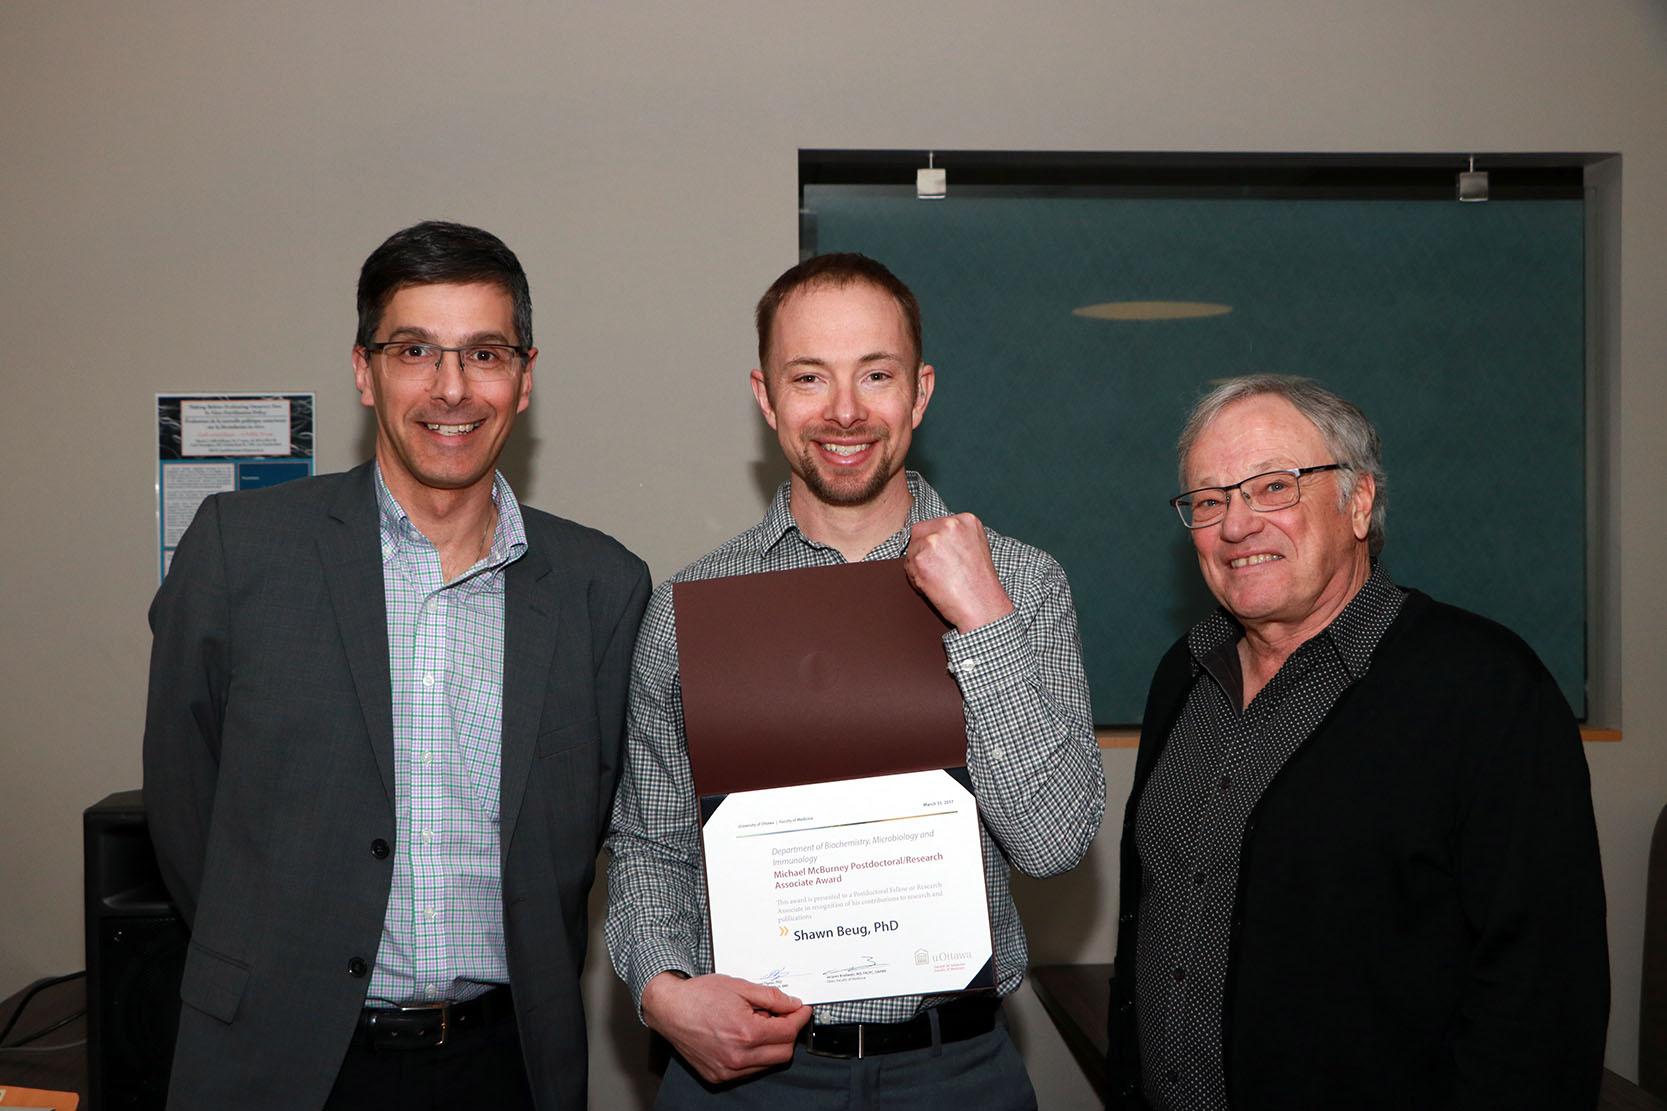 Dr. Daniel Figeys, Dr. Shawn Beug and Dr. Robert Korneluk